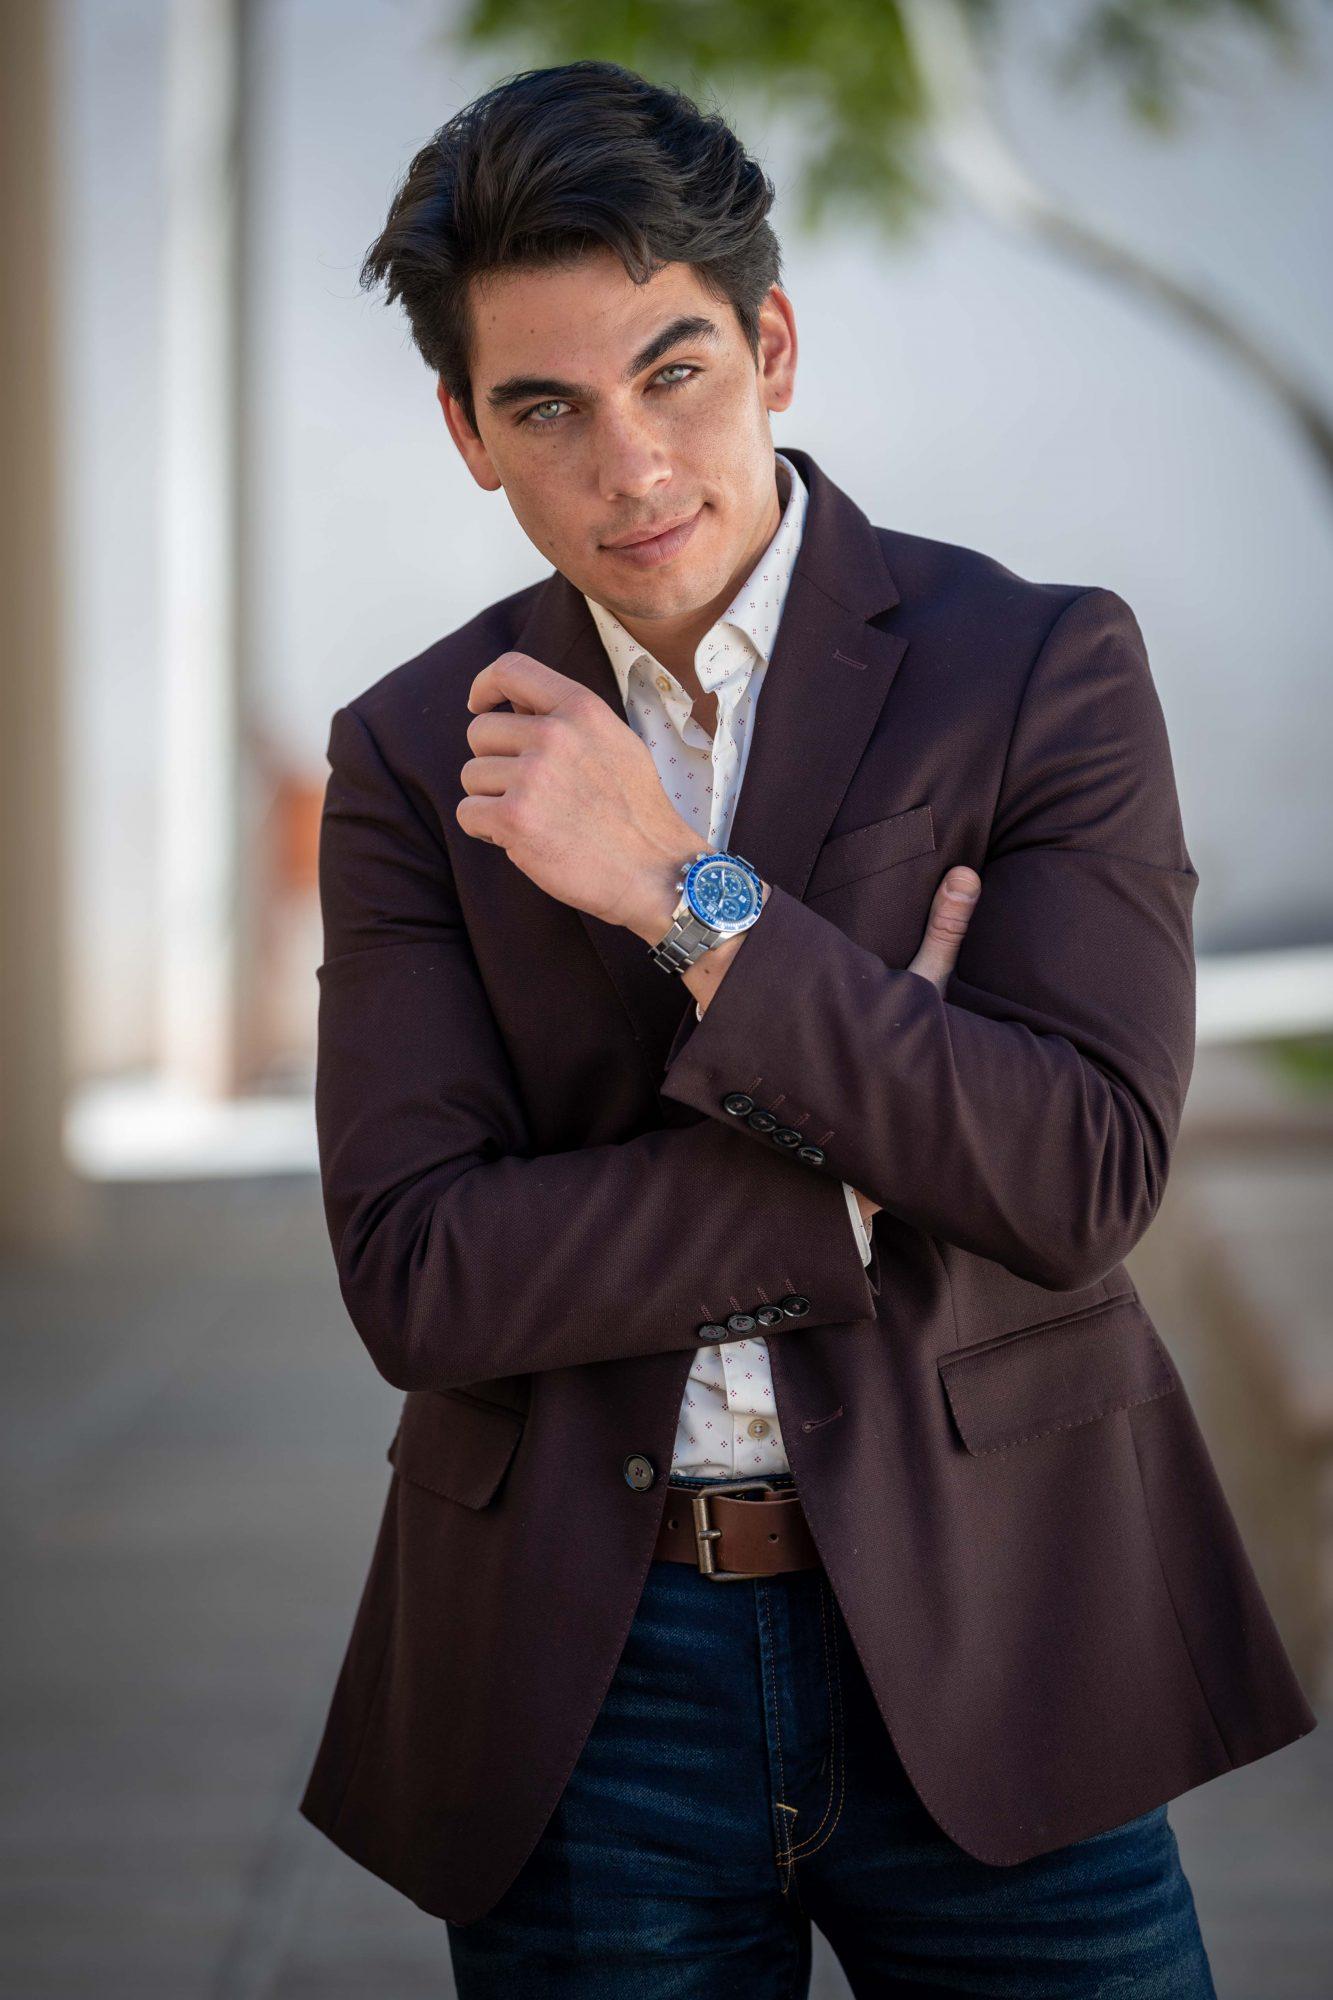 Josh Gutiérrez